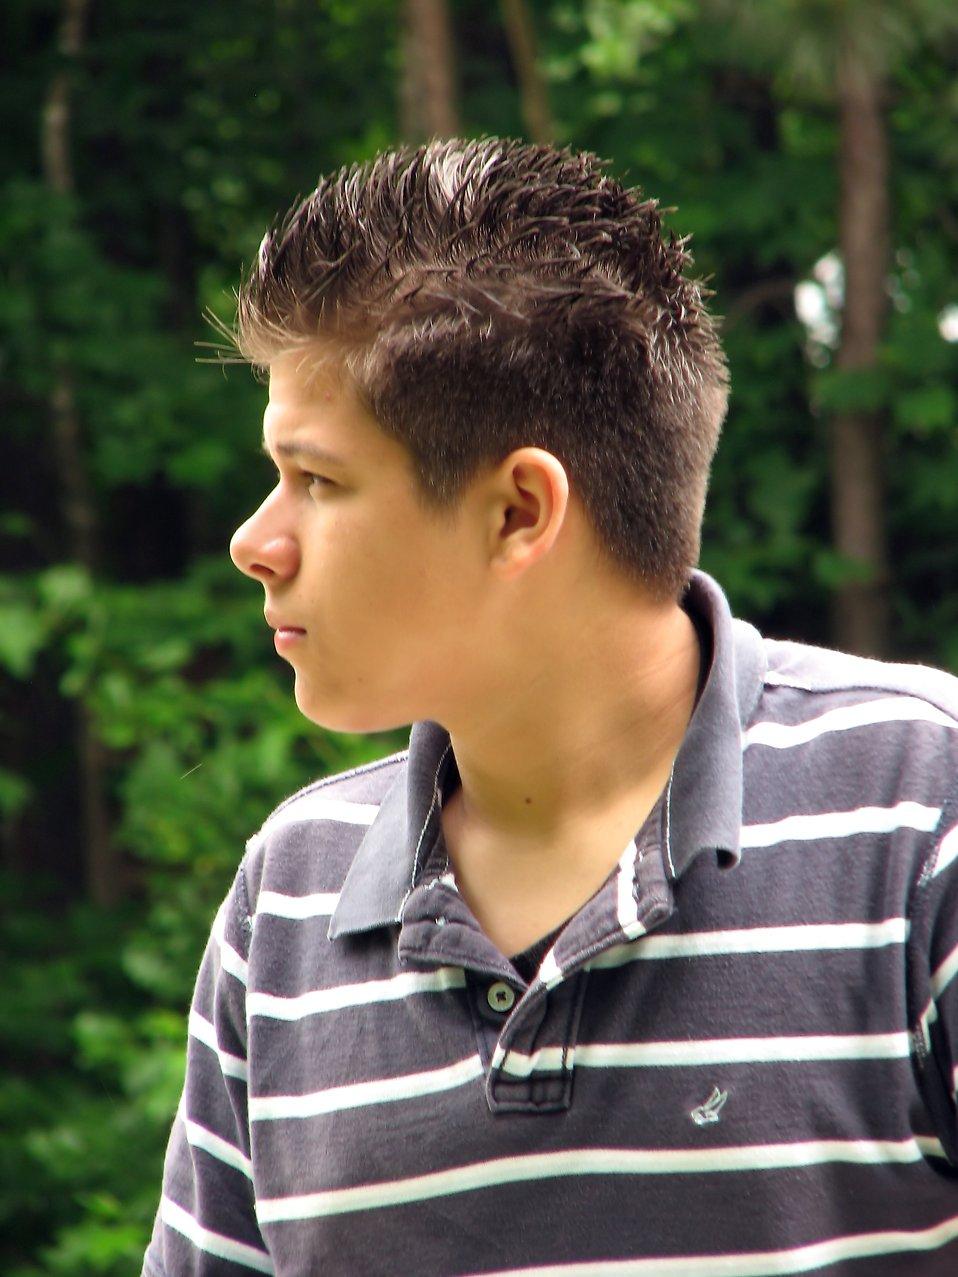 A young latino man posing outdoors : Free Stock Photo